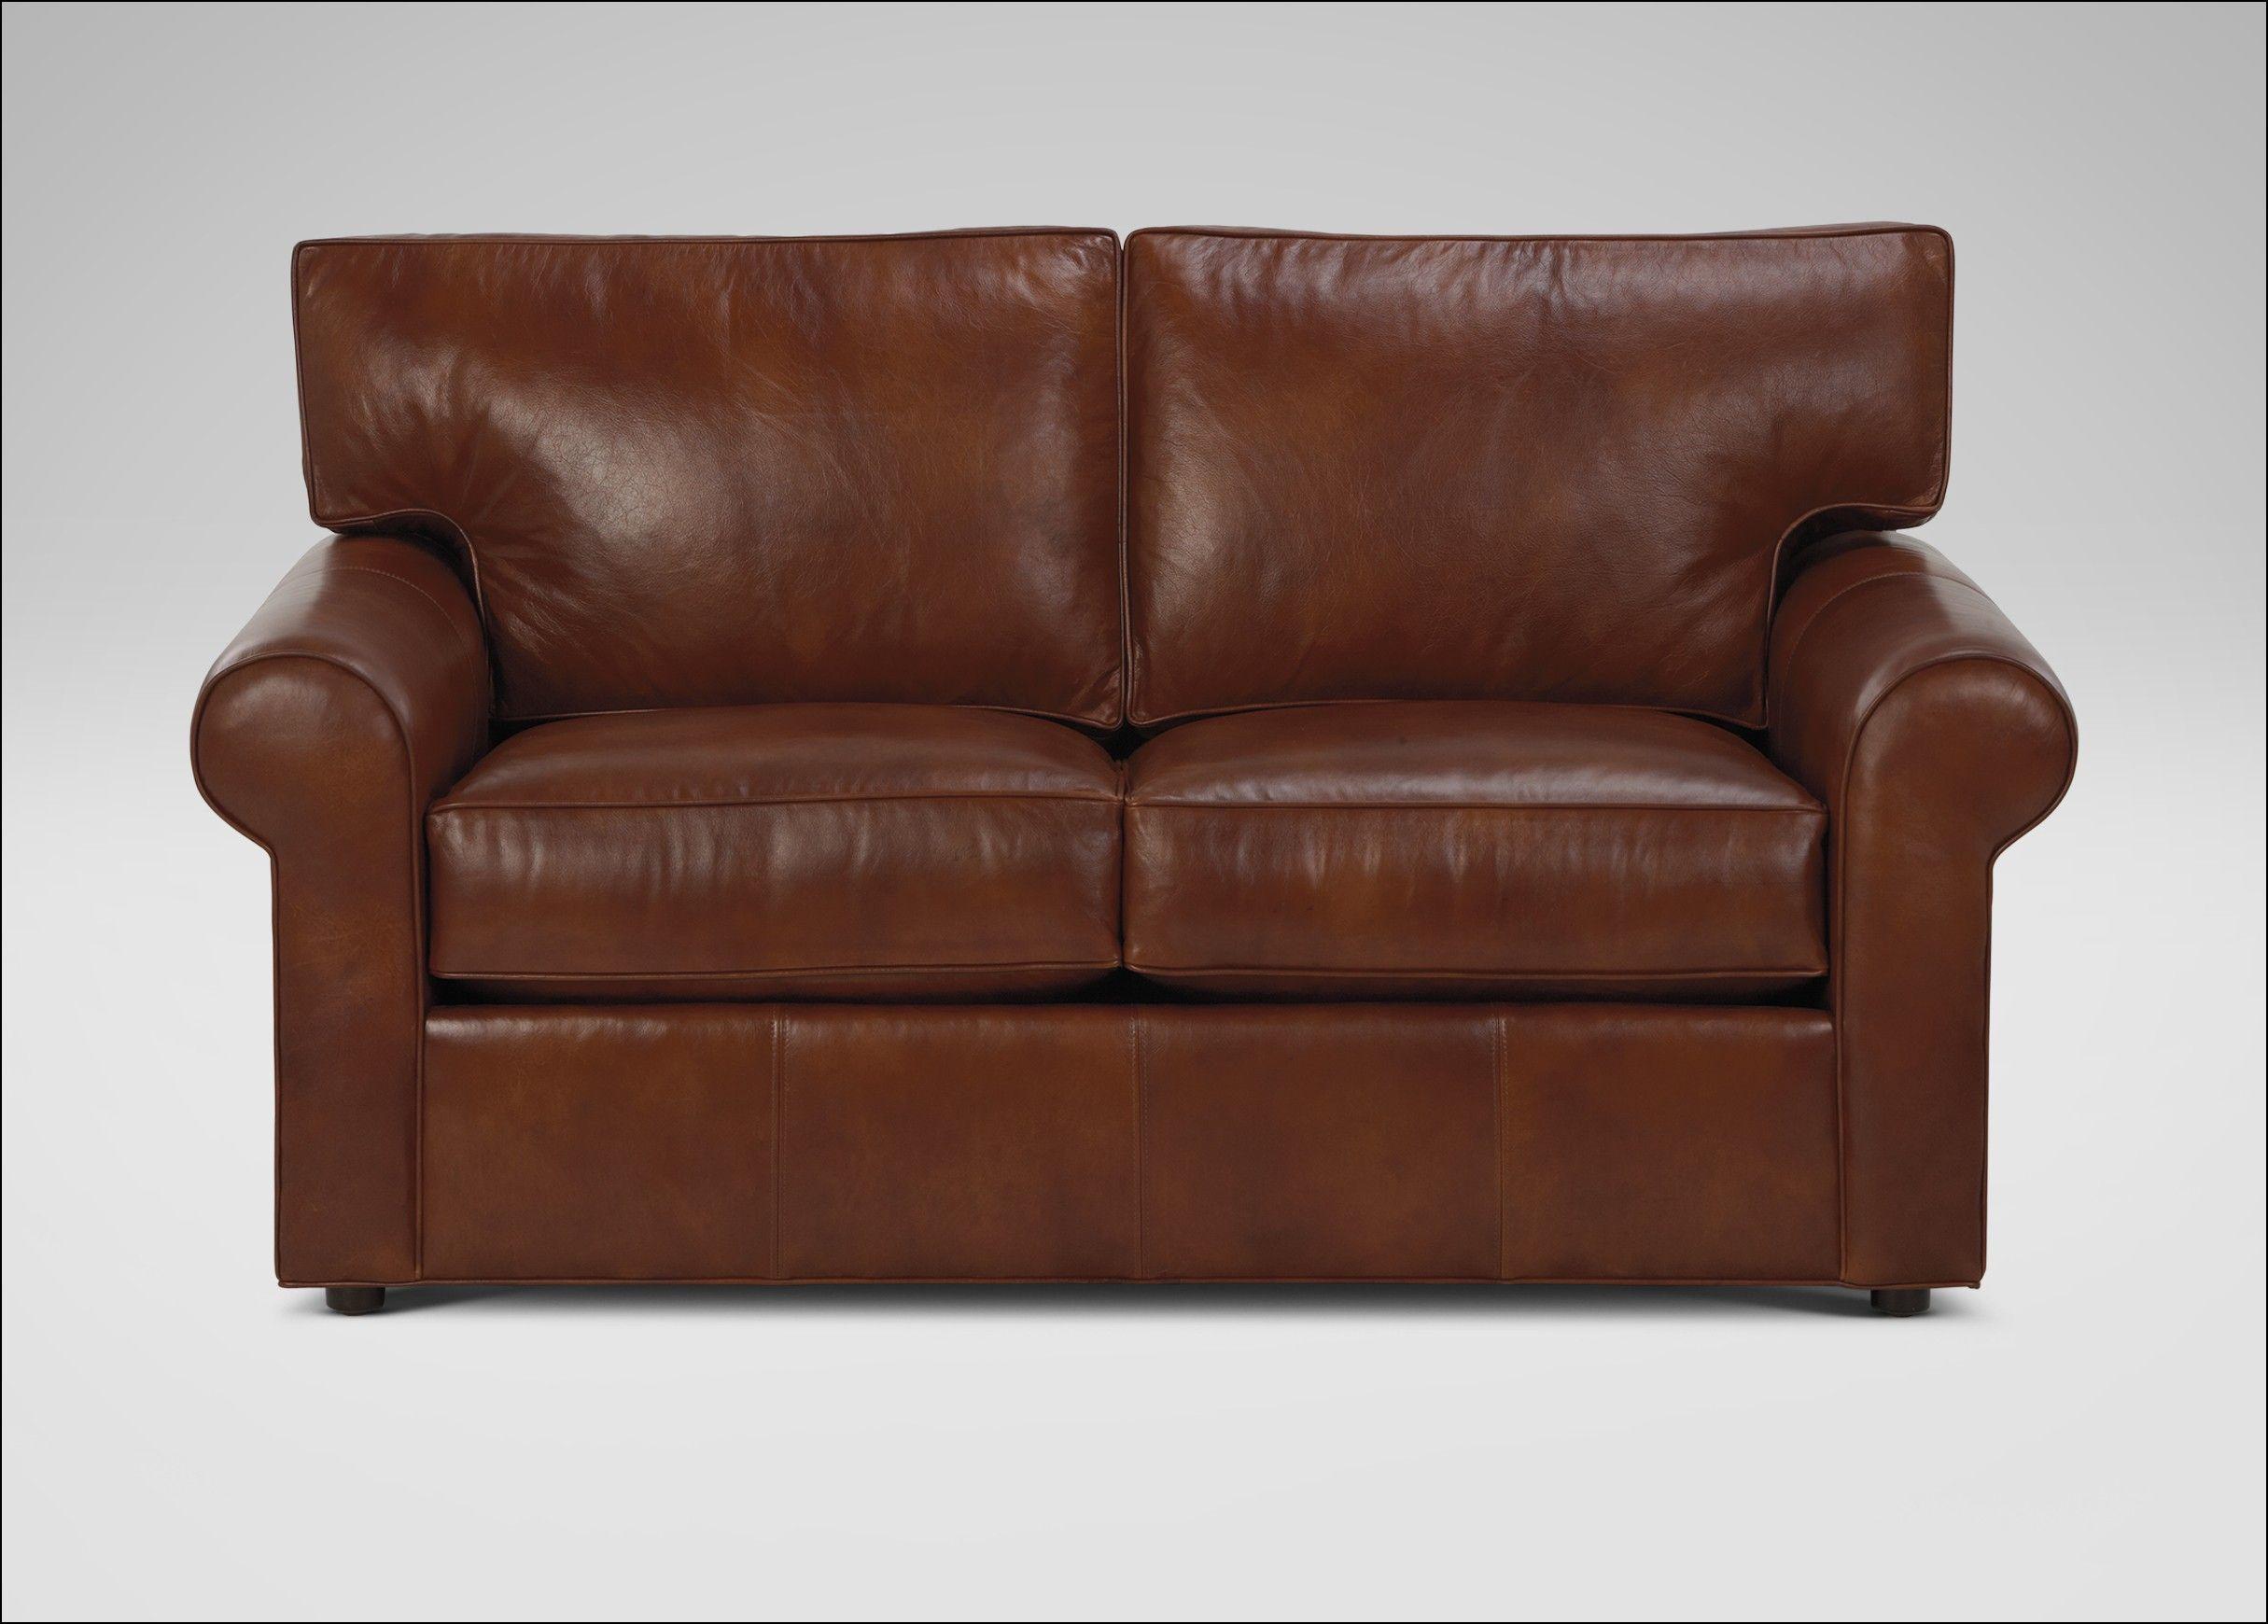 72 Leather Sofa Serta Rta Monaco Collection 72 Inch Brown